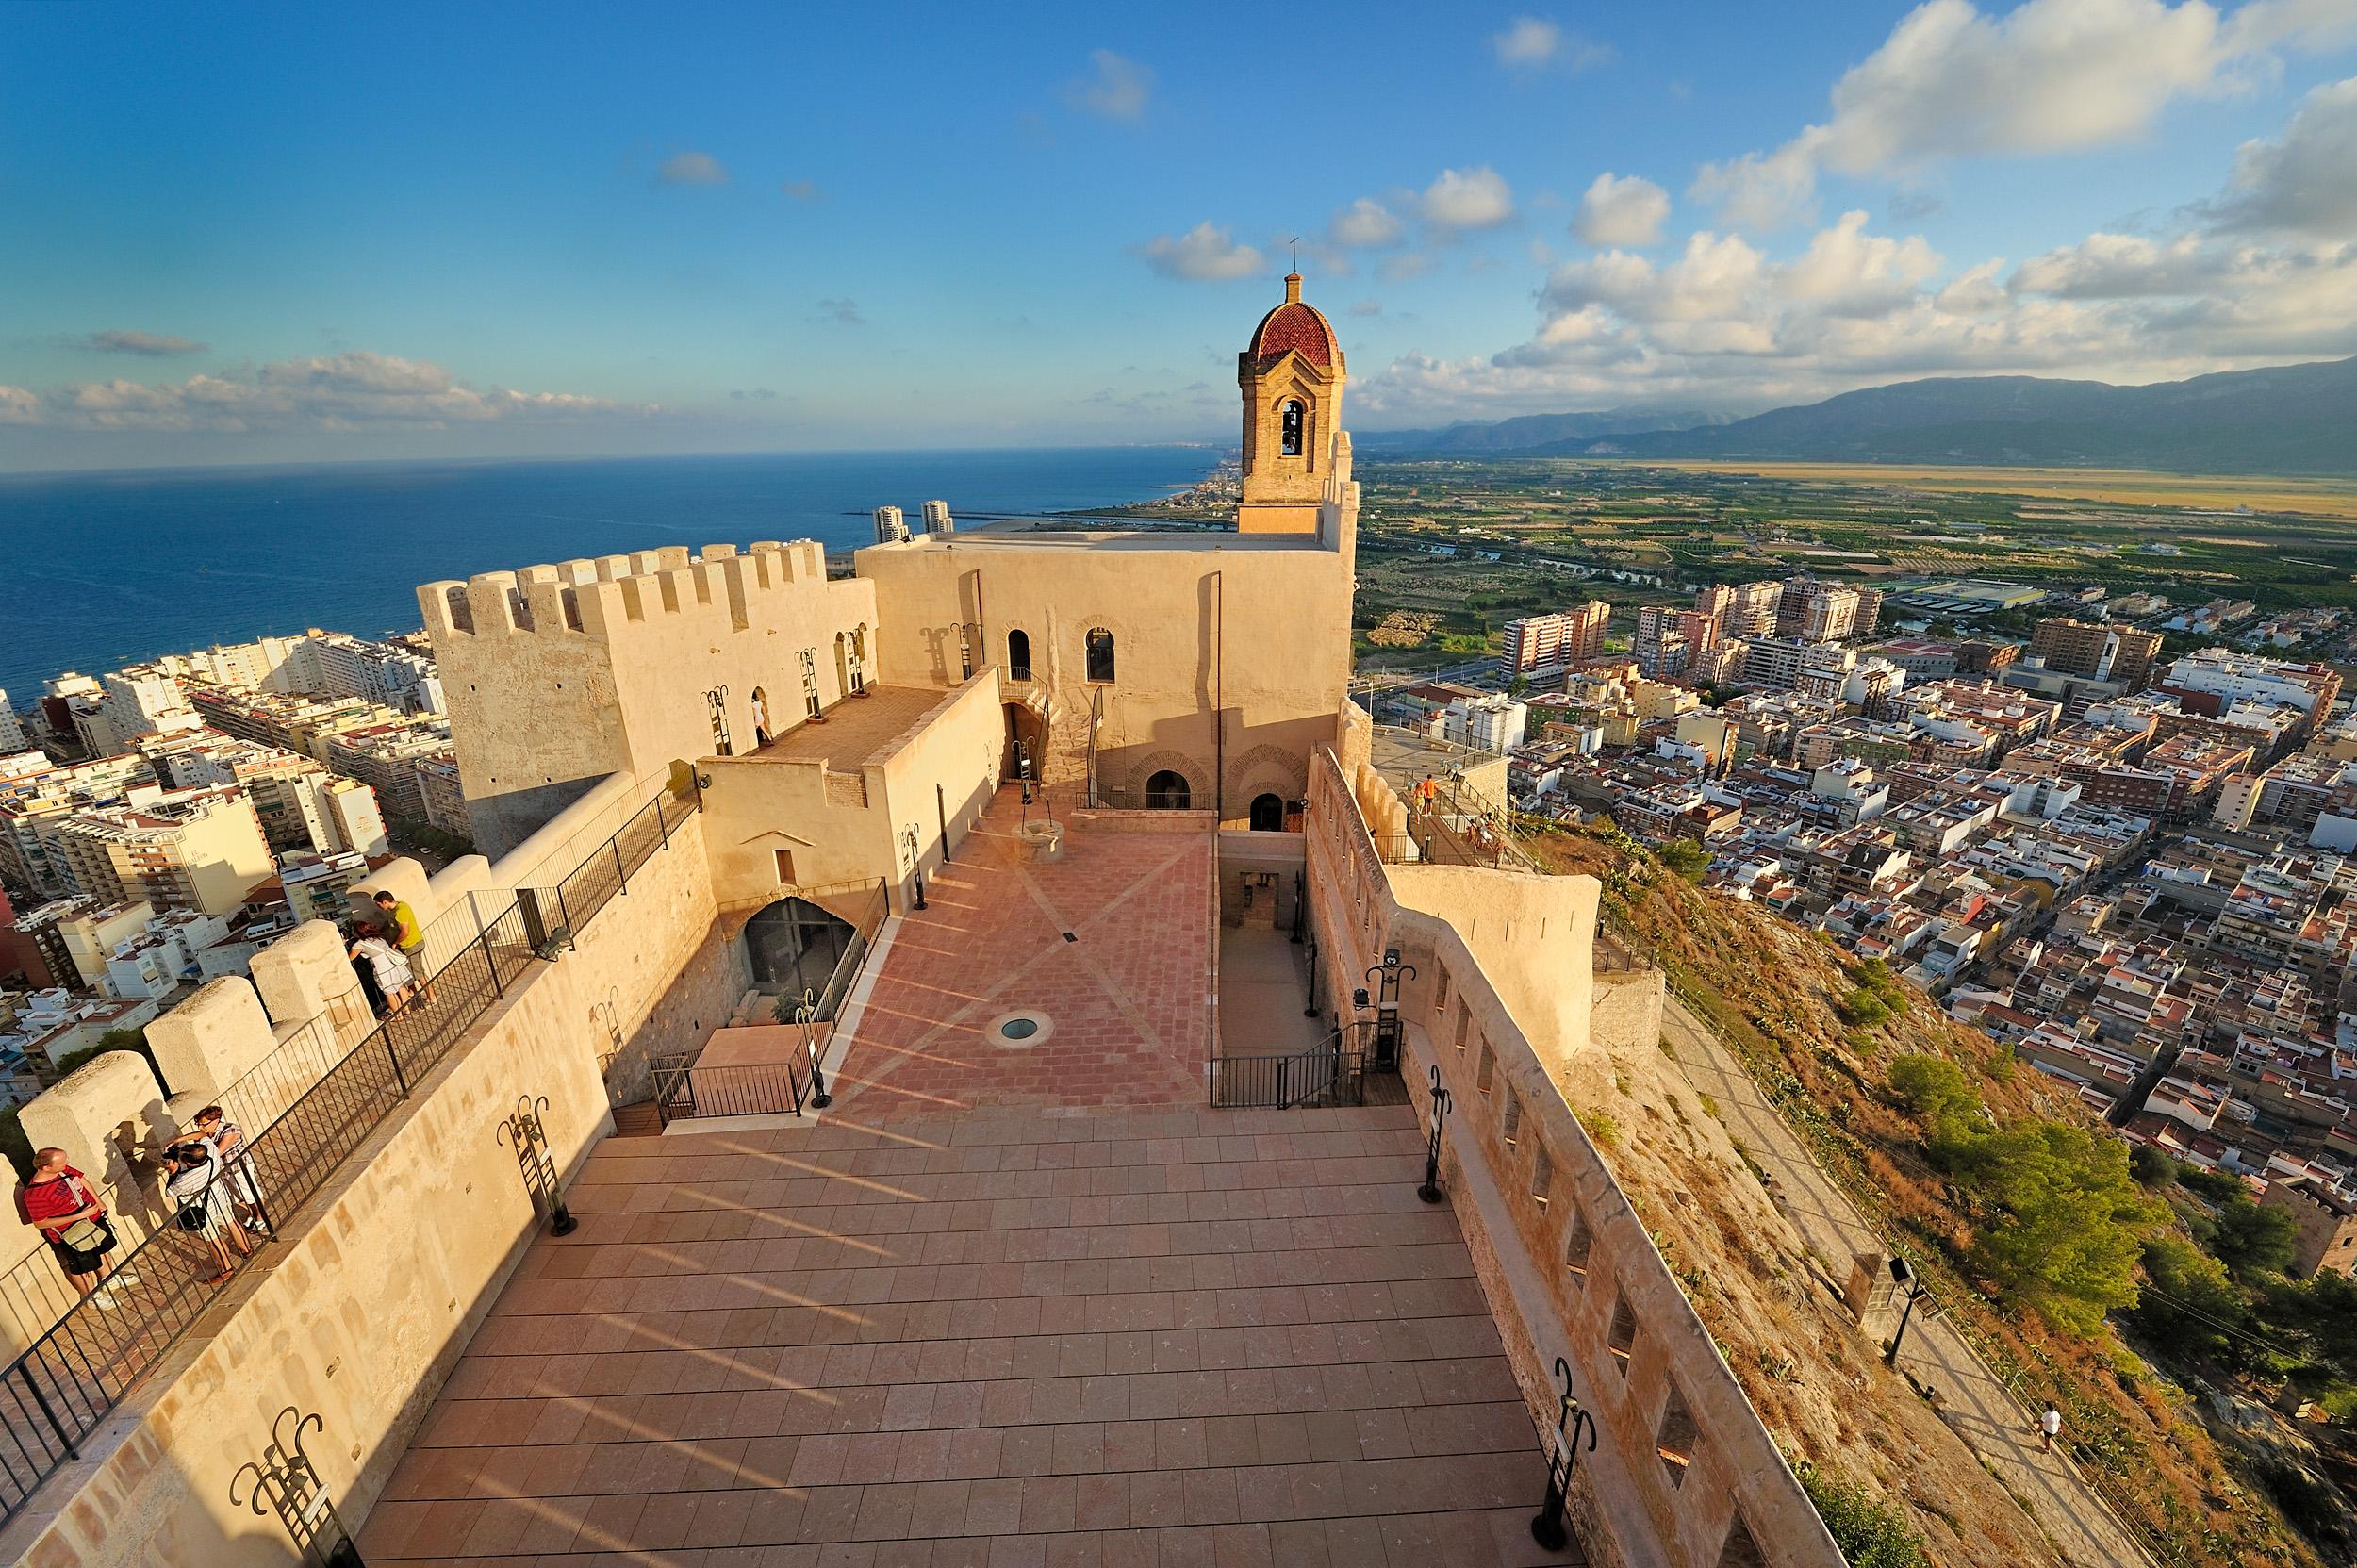 Archivo:Castillo de Cullera.jpg - Wikipedia, la enciclopedia libre